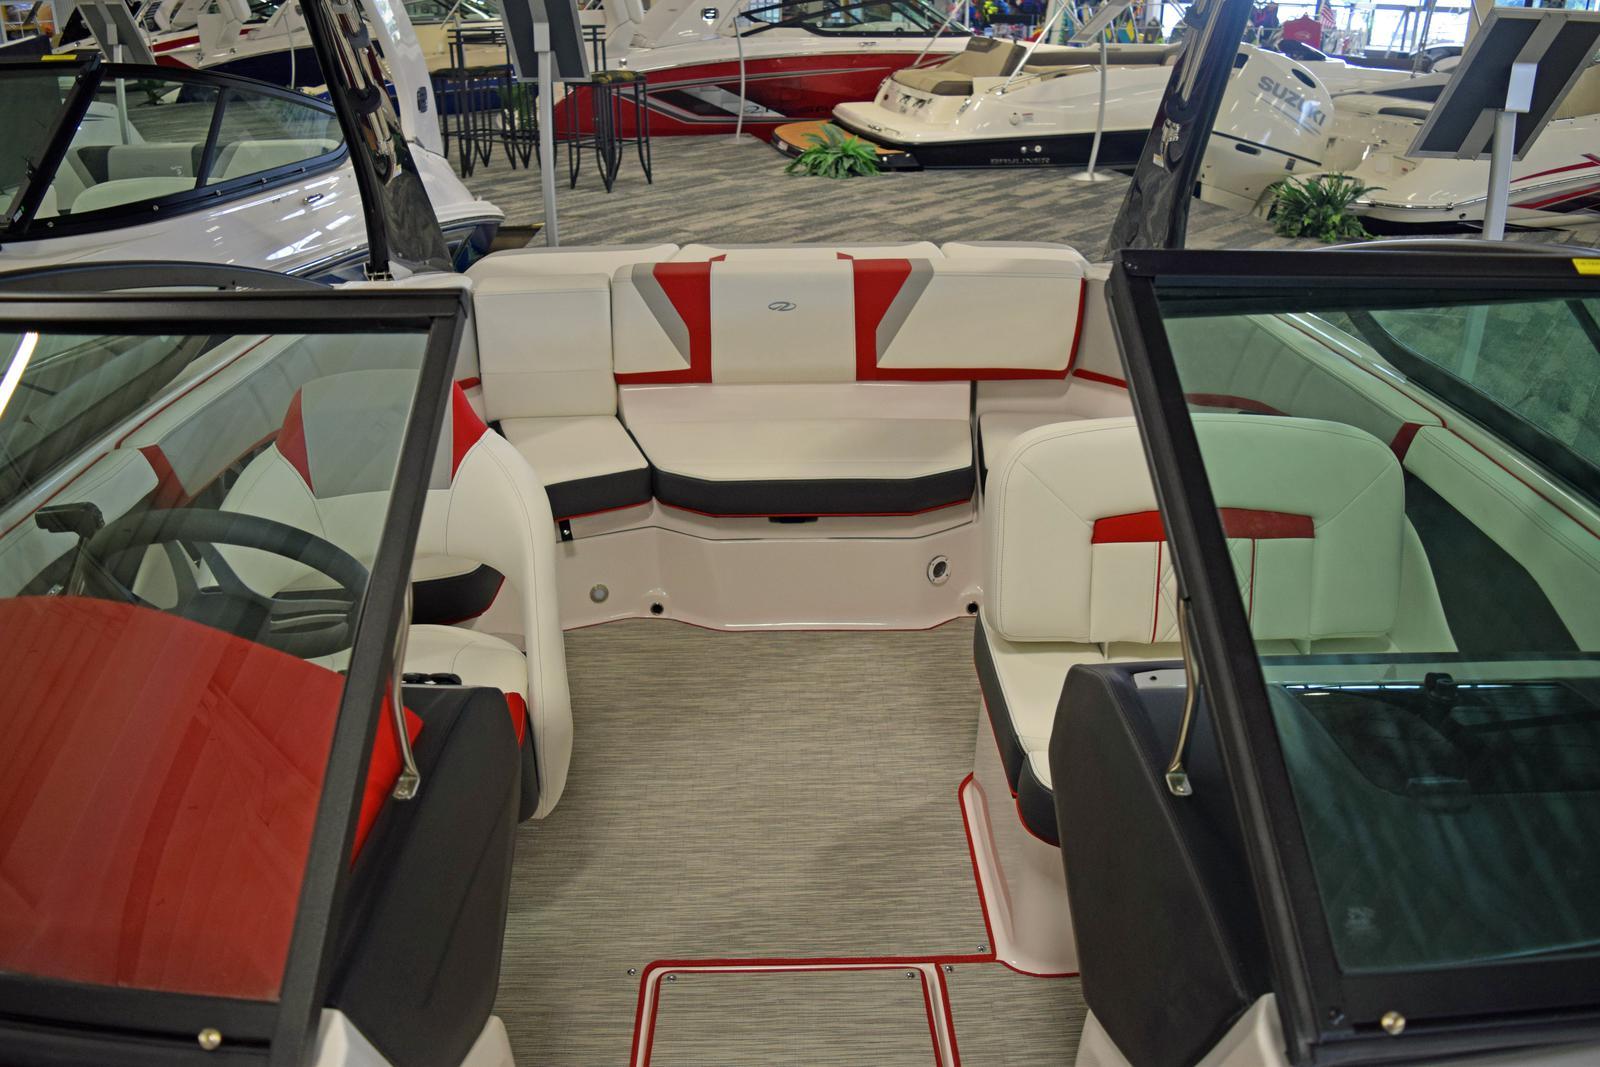 2019 Regal 2000 ES for sale in Indianapolis, IN  Marine